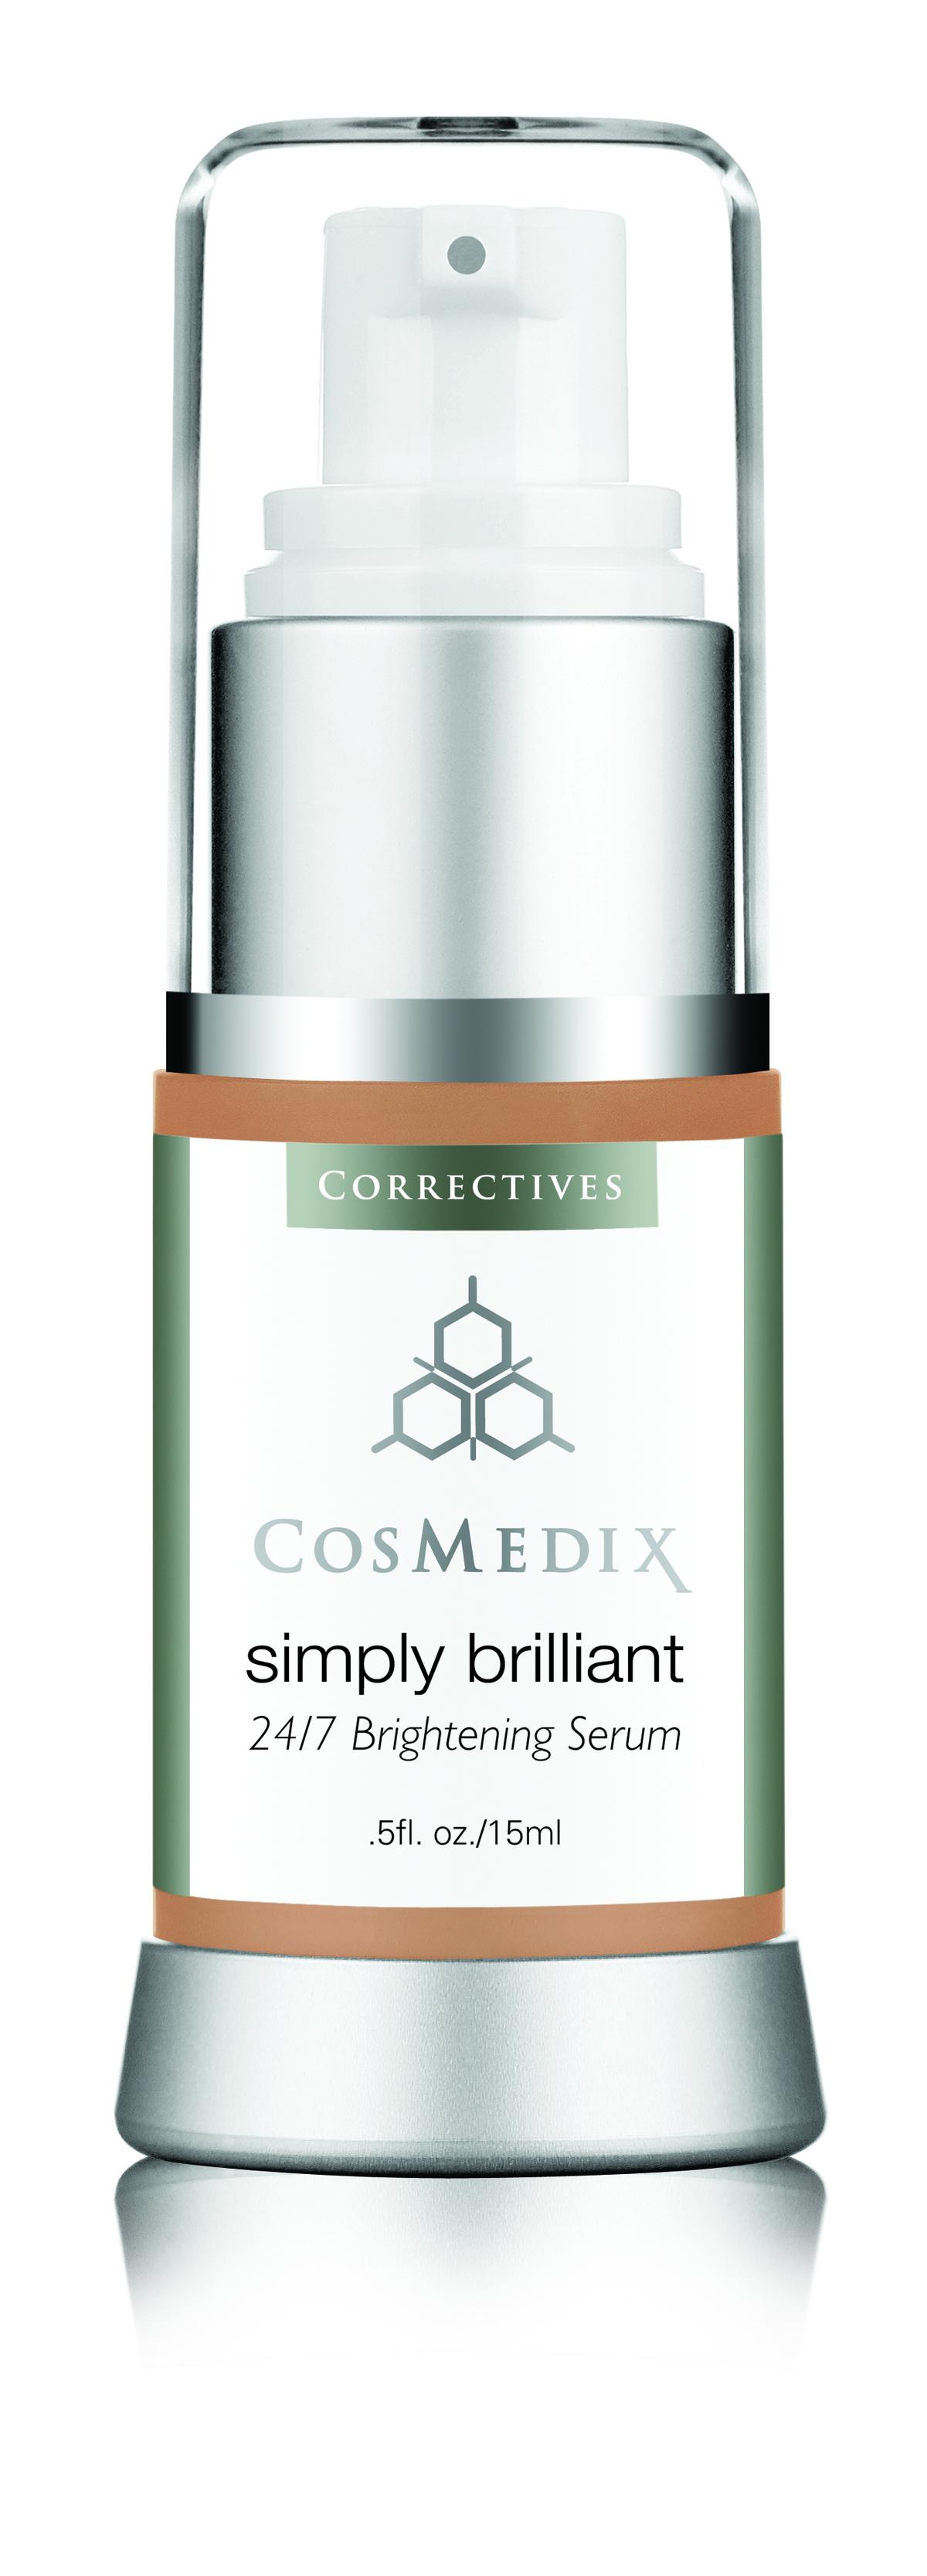 Cosmedix Simply Brilliant 24/7 Brightening Serum - Bellyrubz